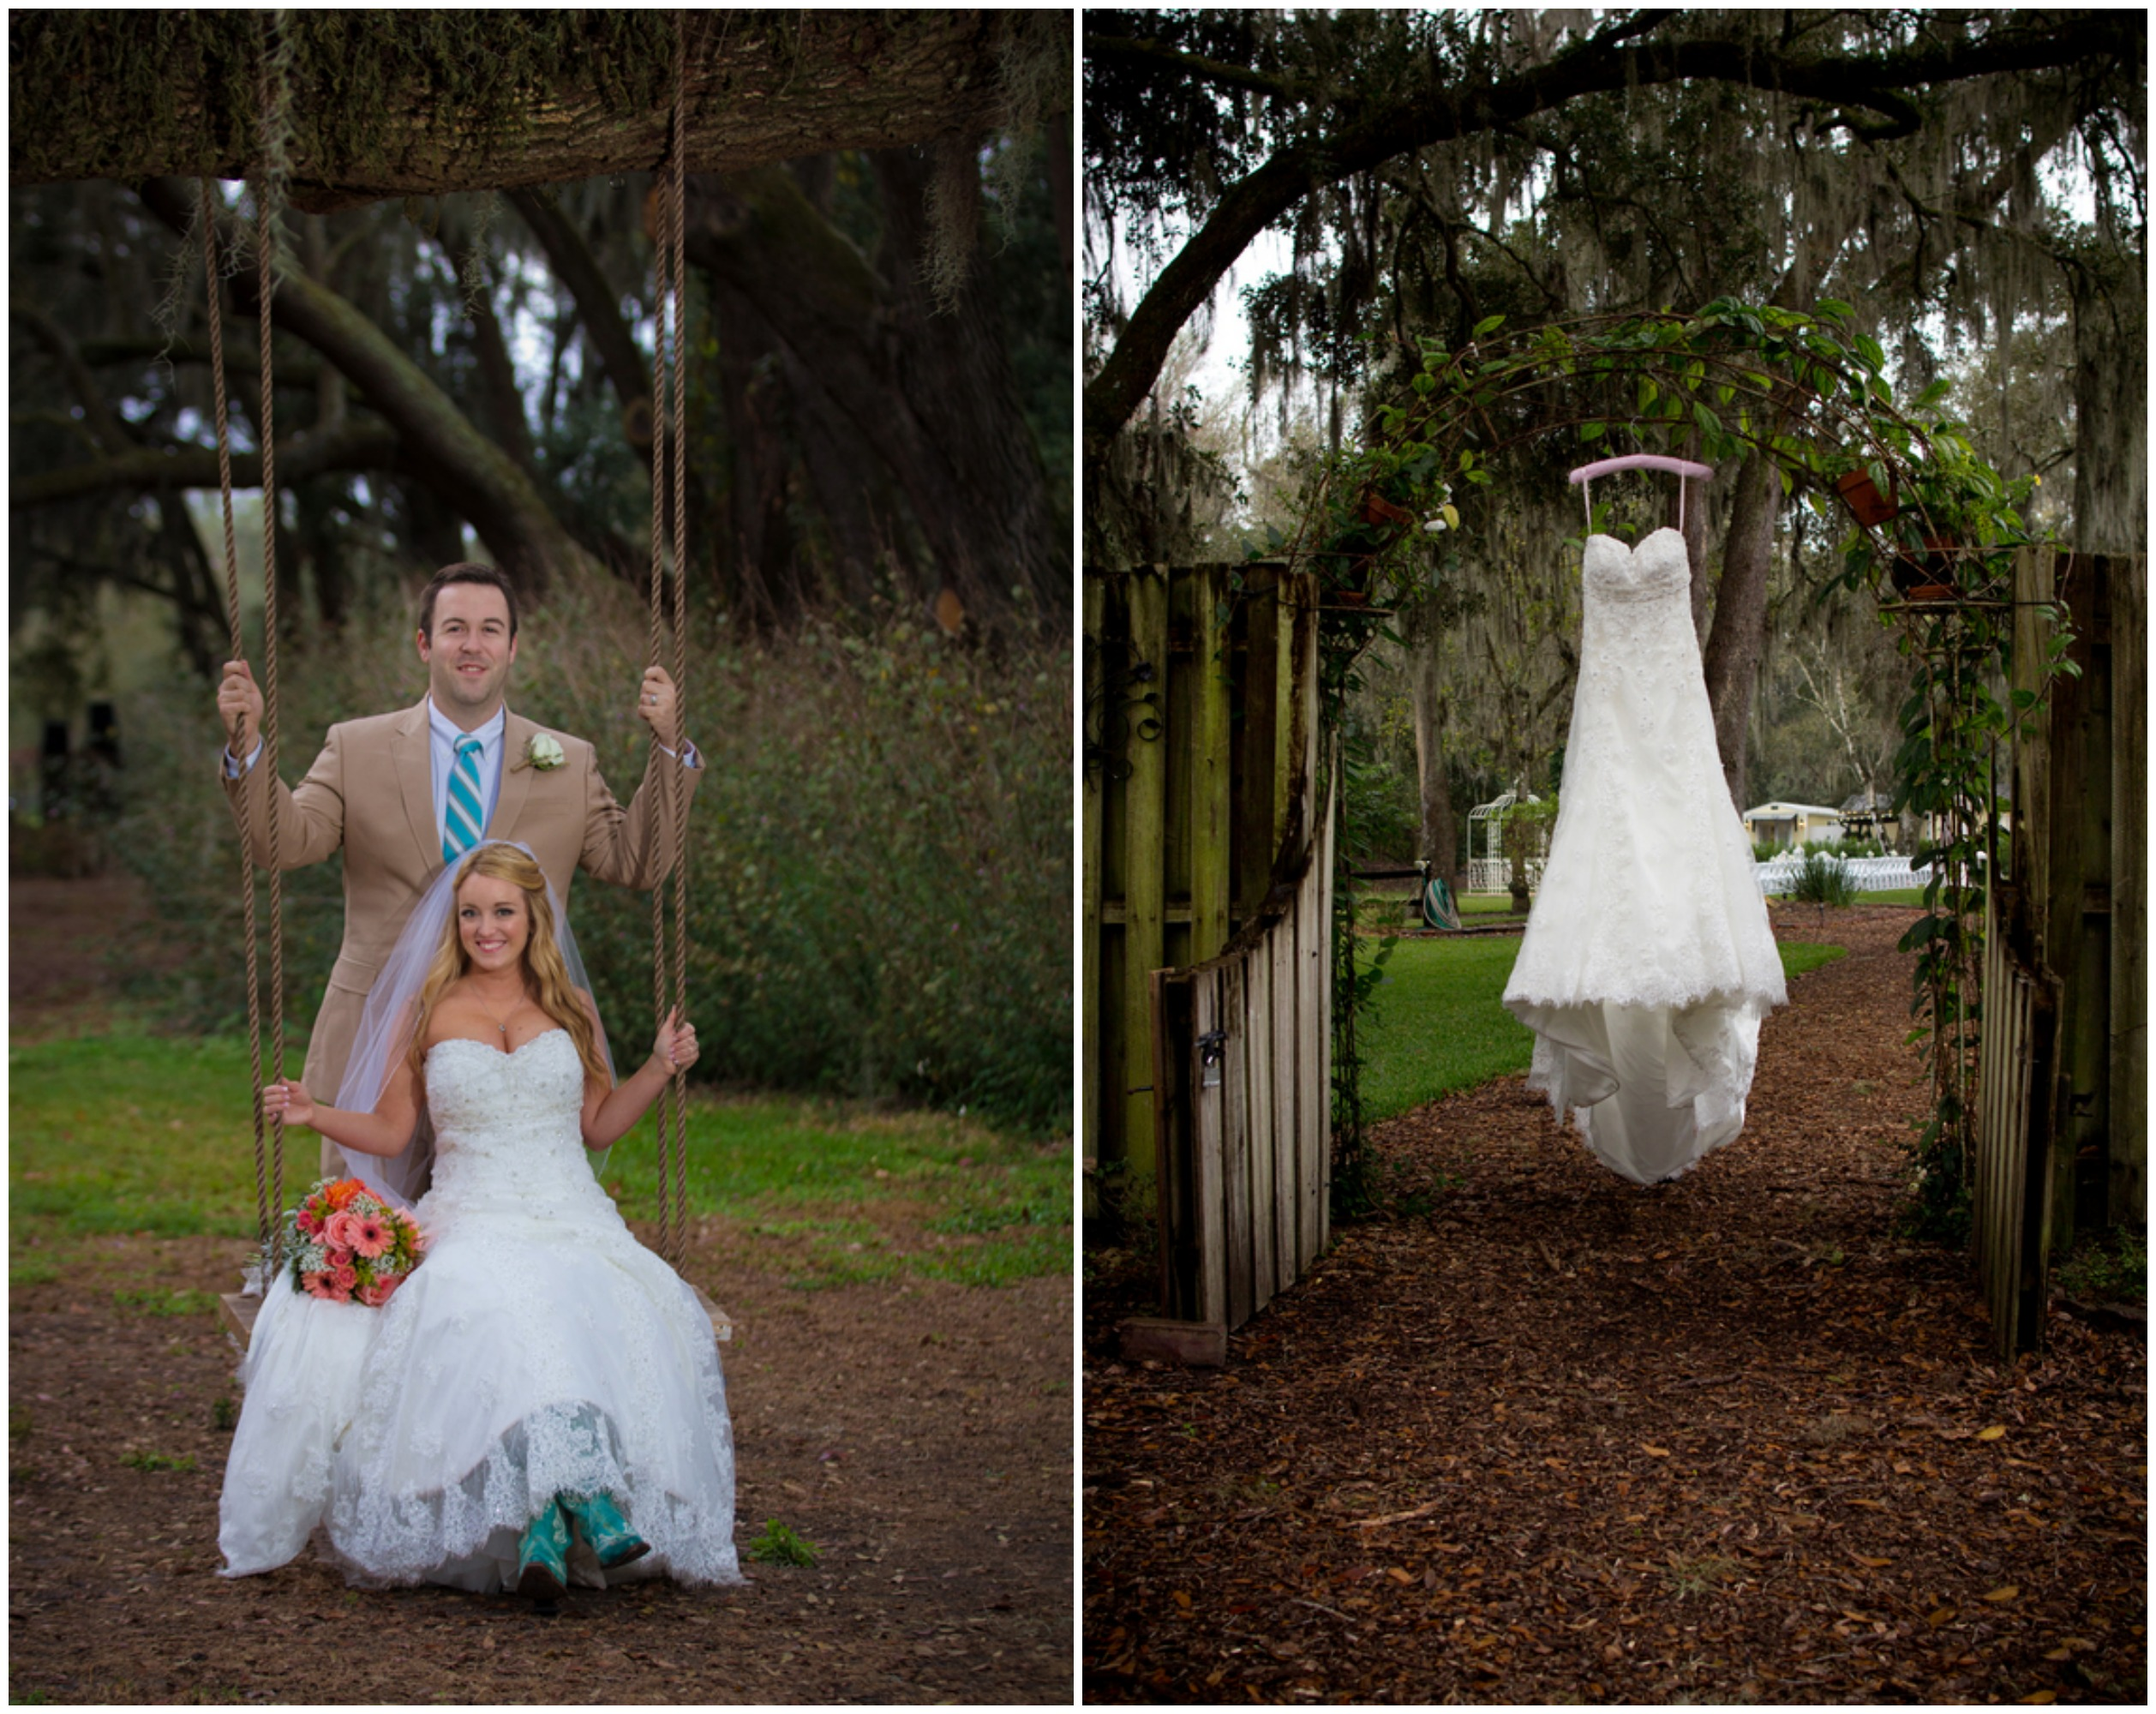 Chic Rustic Country Wedding: Florida Barn Wedding At Cross Creek Ranch